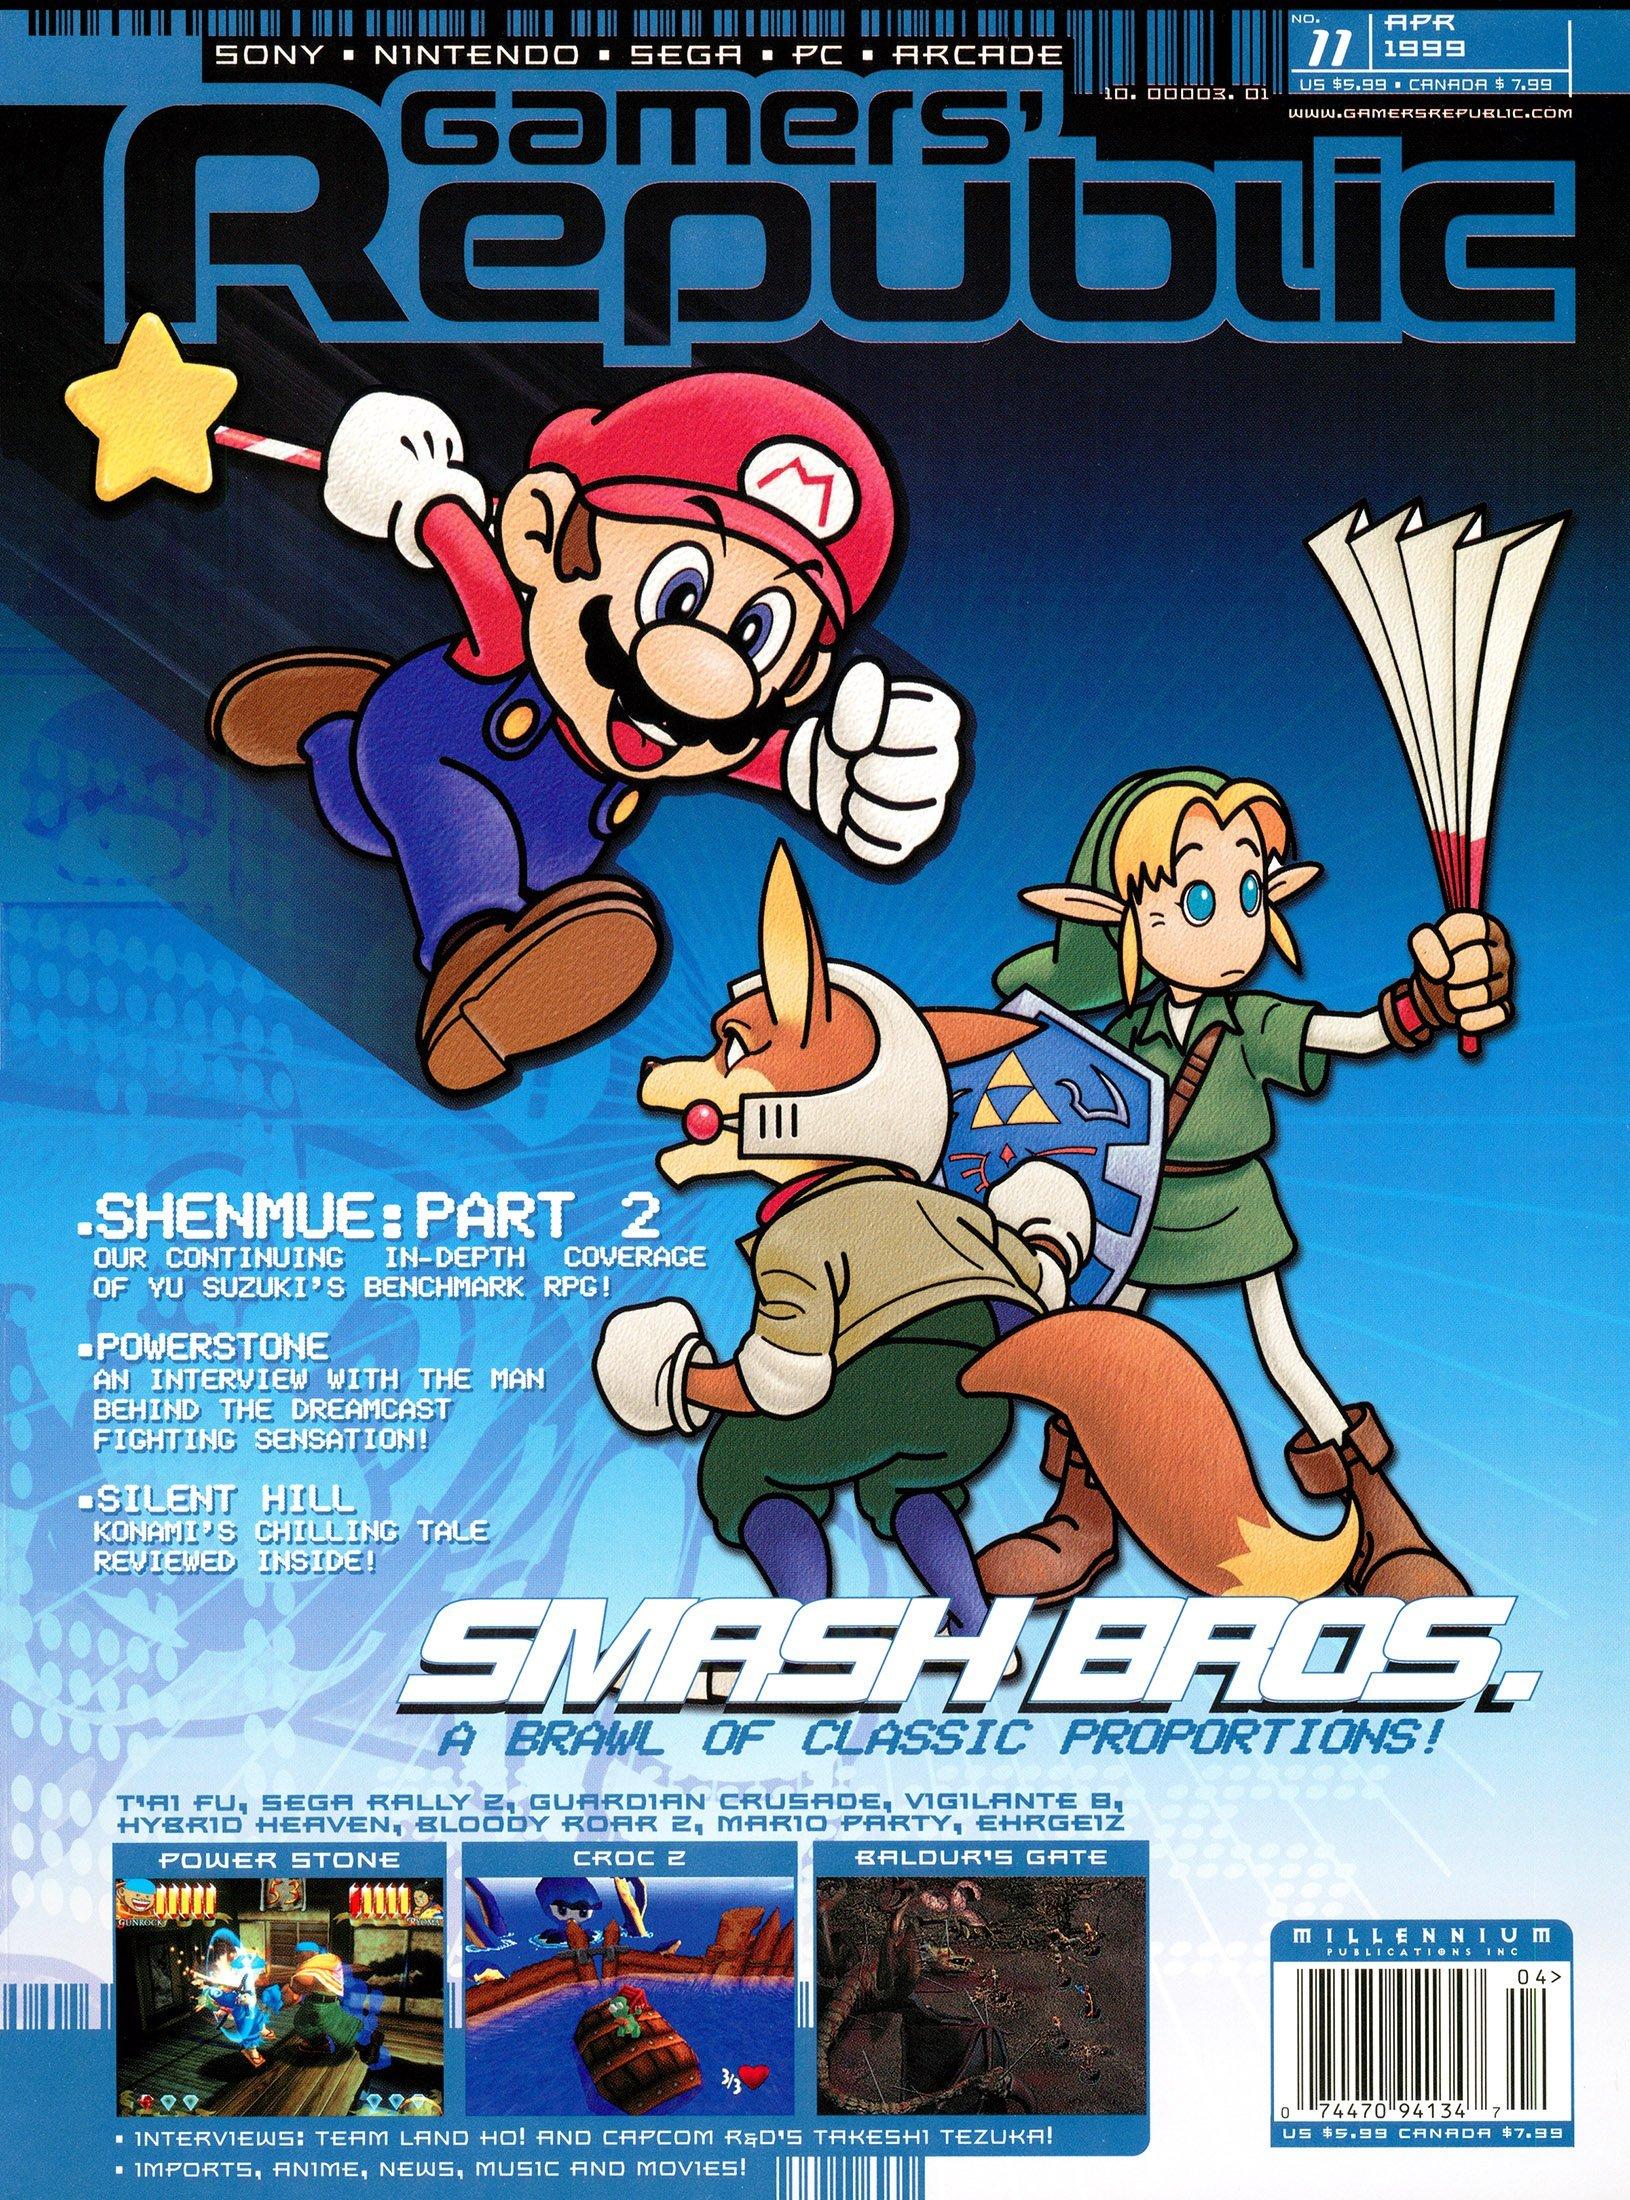 Gamers Republic issue 011 April 1999